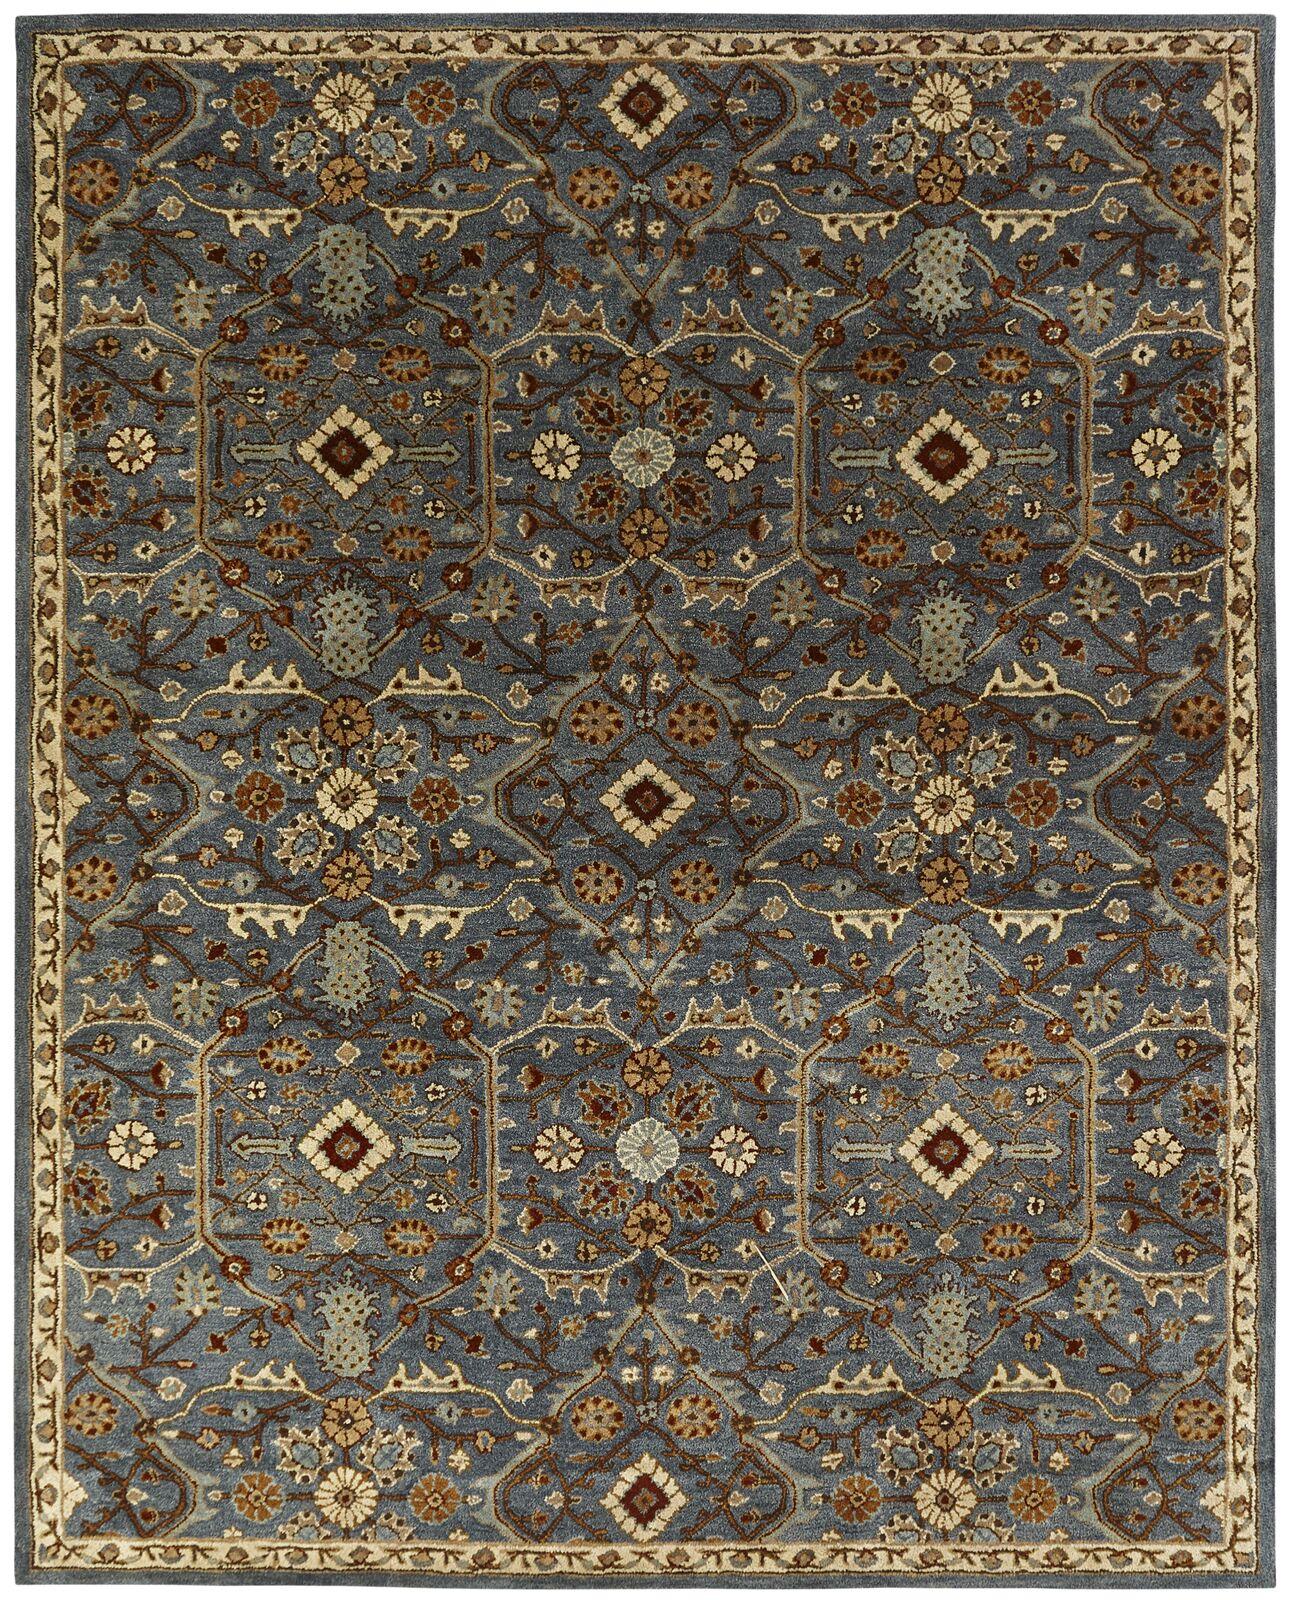 Chana Hand-Woven Blue/Brown Area Rug Rug Size: Rectangle 9'6